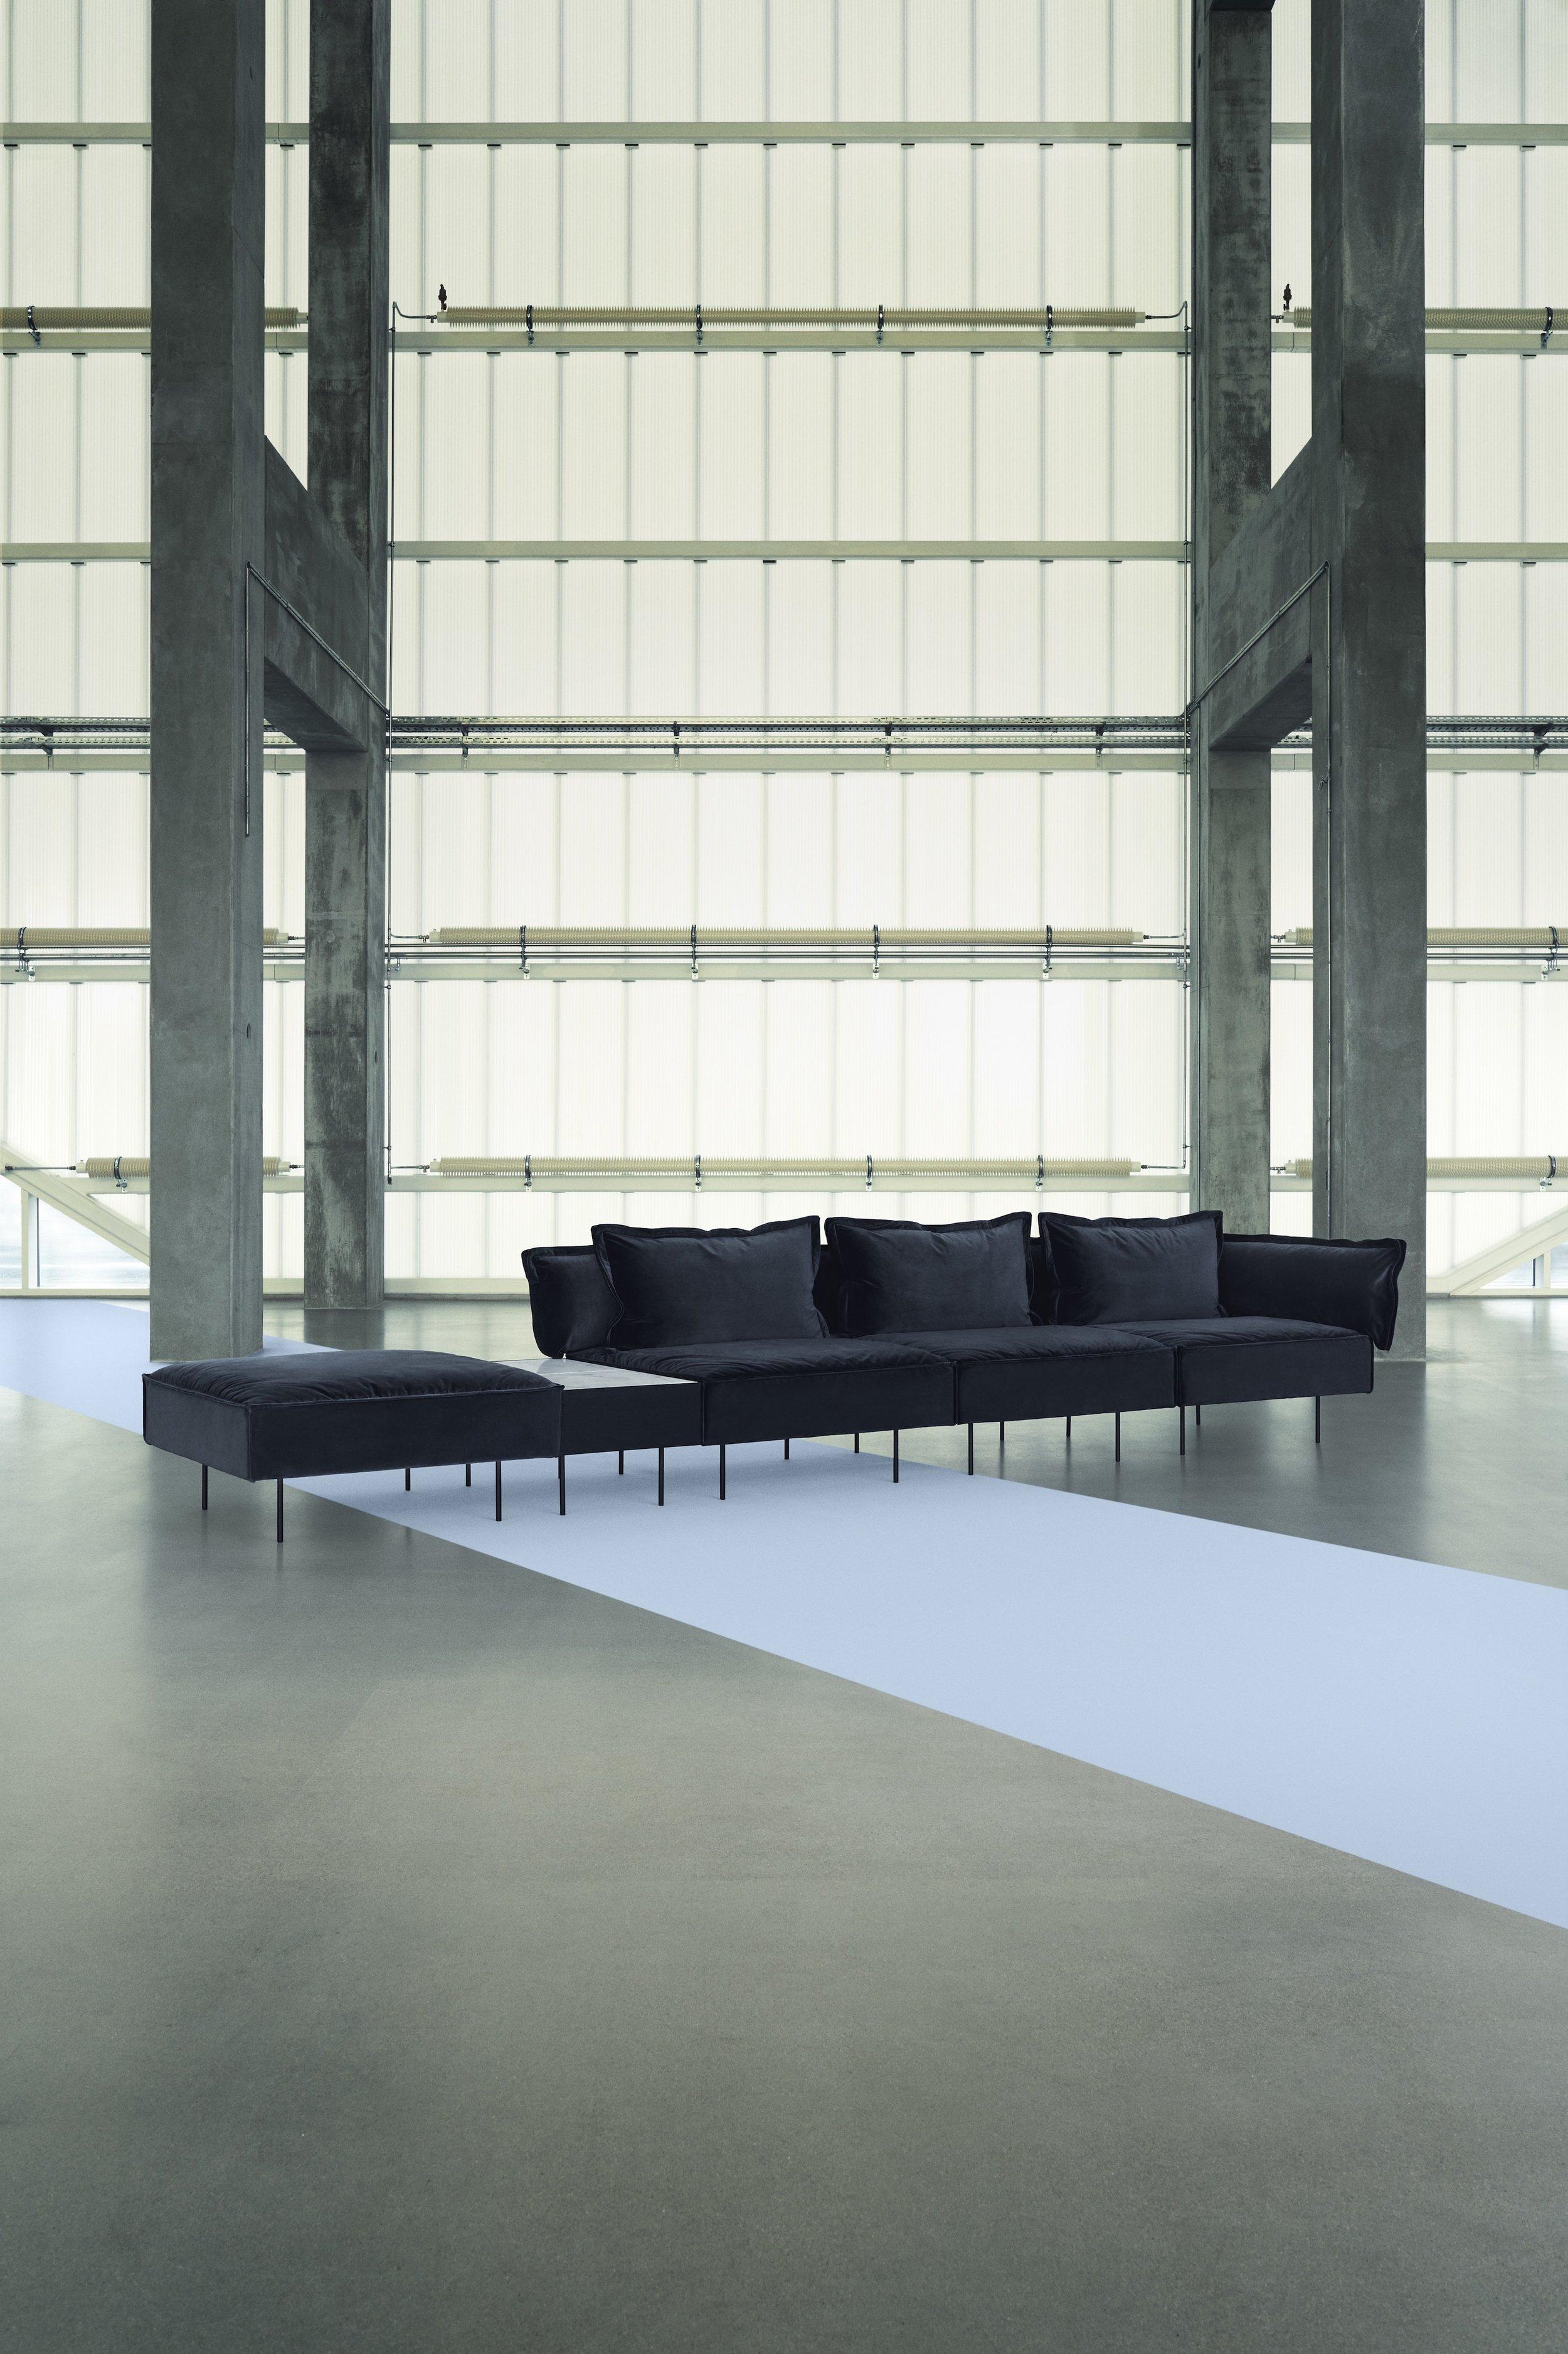 _HANDVARK CAMPAIGN 2017 - Modular Sofa in Dark Grey with White Marble table Portrait.jpeg